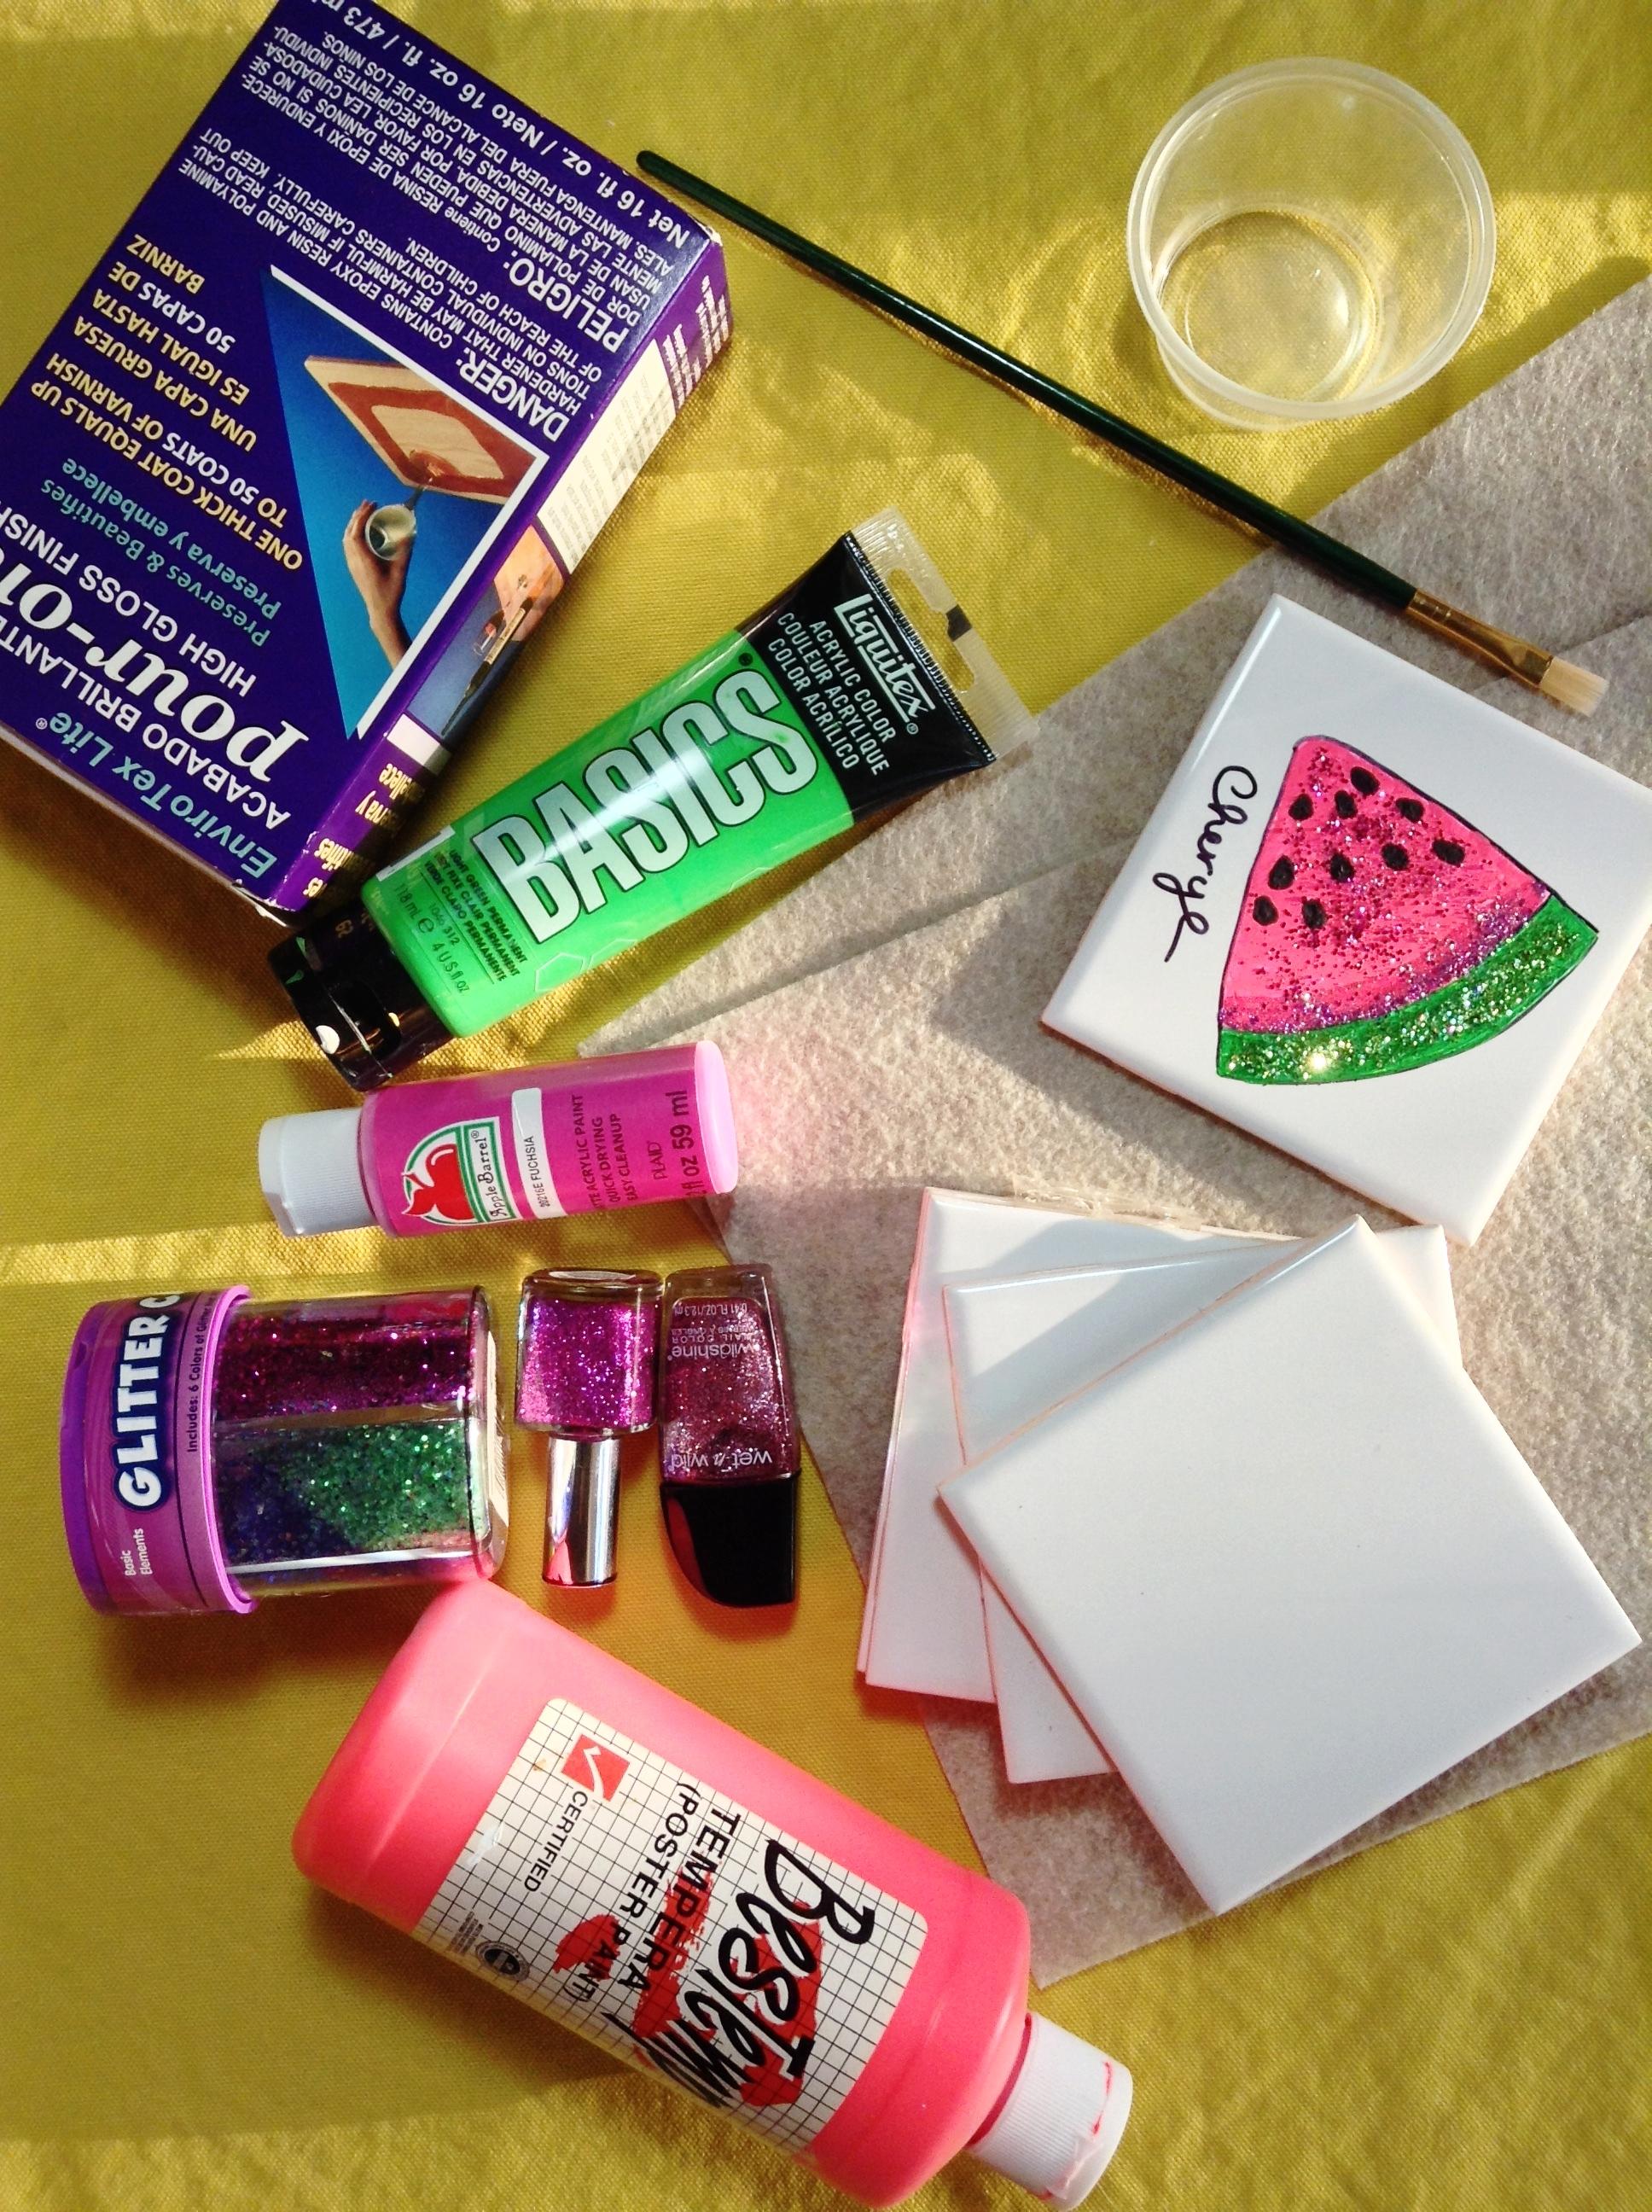 Supplies/Product List - -Ceramic tiles- Thrift store/Lowes-Paints or scrapbook paper- Michael's Arts & Crafts-Glitter- Glitter Caddy & nail polish-Mod Podge-Sealant- Enviro Tex Lite- Michael's Arts & Crafts-Felt squares- Michael's Arts & Crafts-Black marker- Sharpie